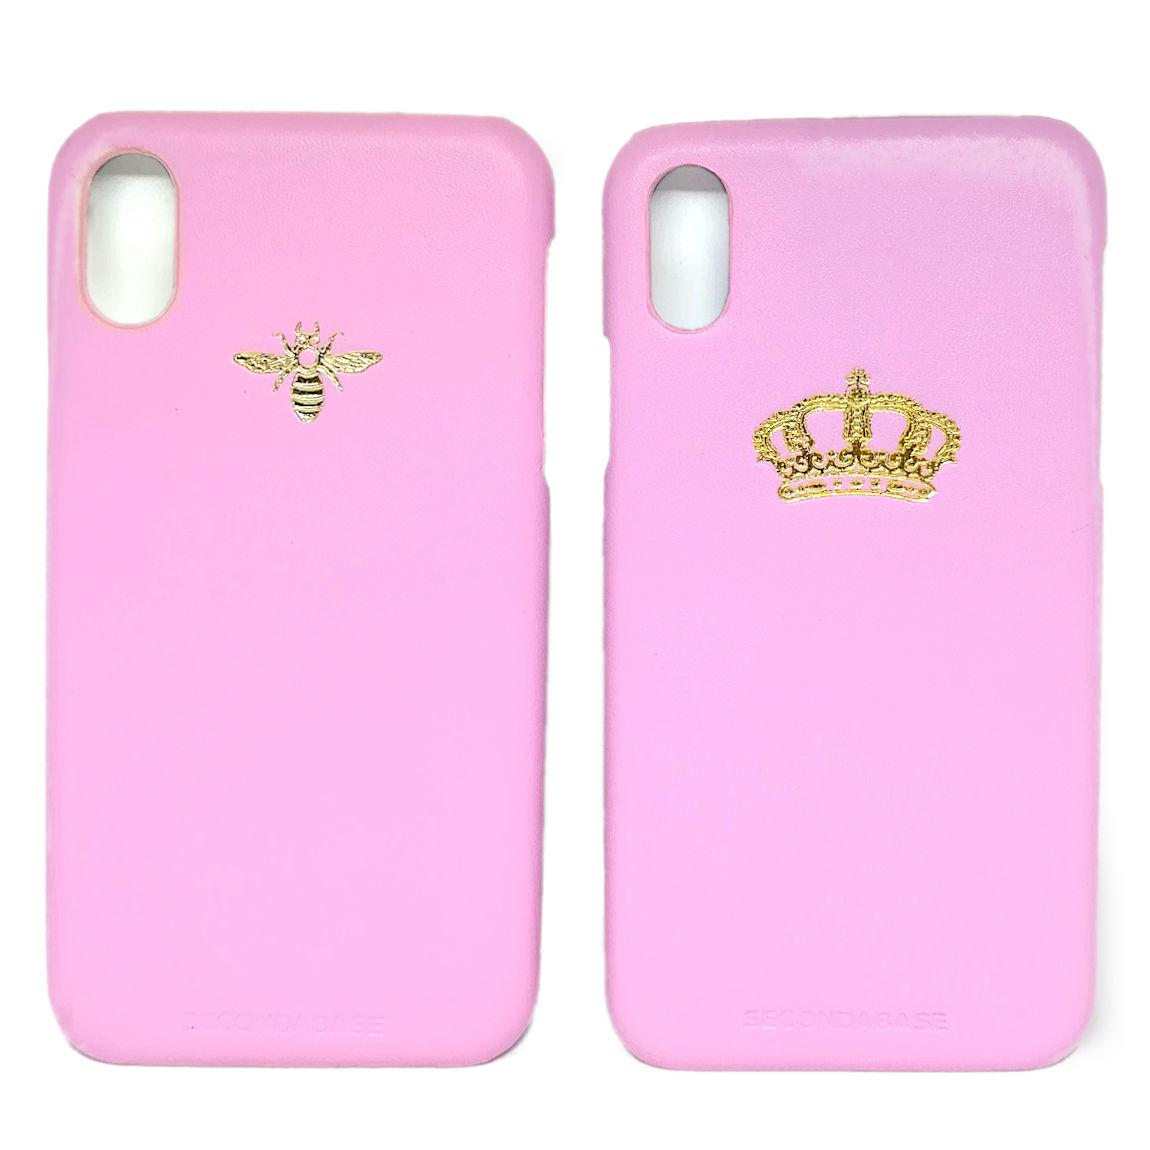 Cover in ecopelle rosa marchiata oro a caldo per iPhone X Xs Xr XMax XsMax